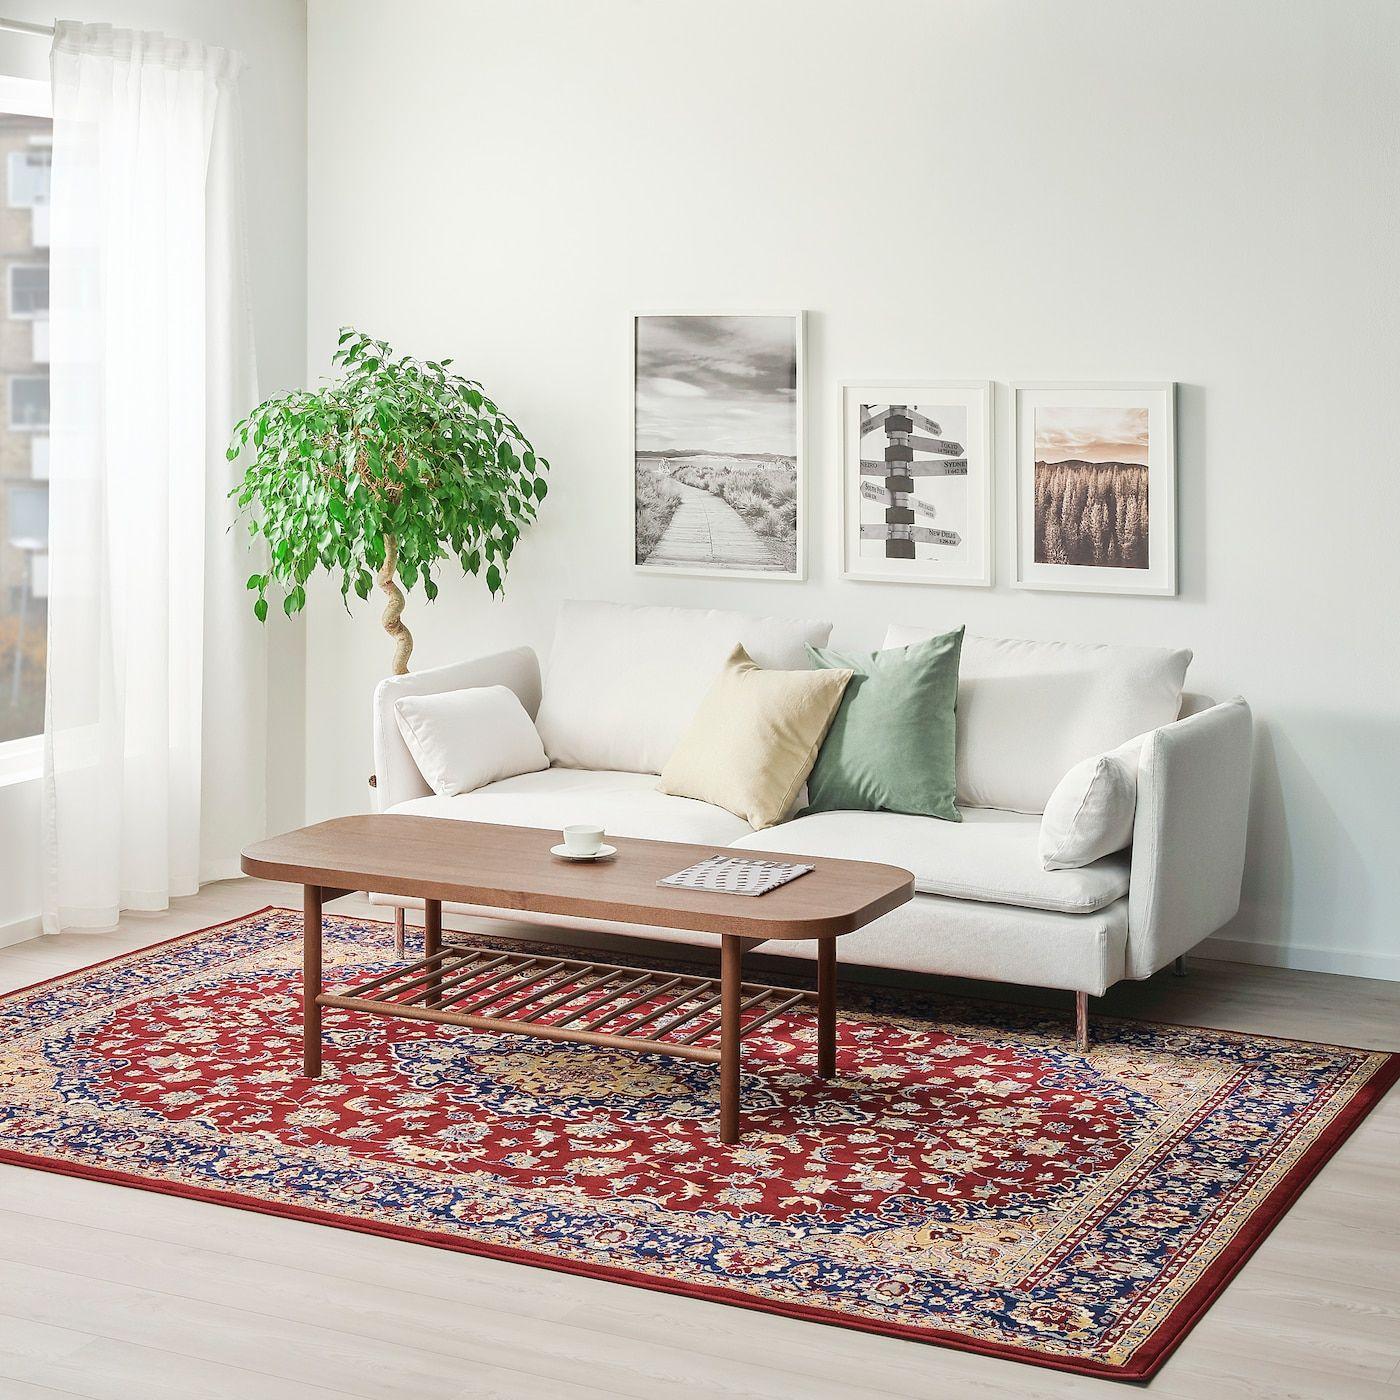 VedbÄk Multicolour Rug Low Pile Length 300 Cm Ikea Teppich Reinigen Teppich Ikea Inspiration